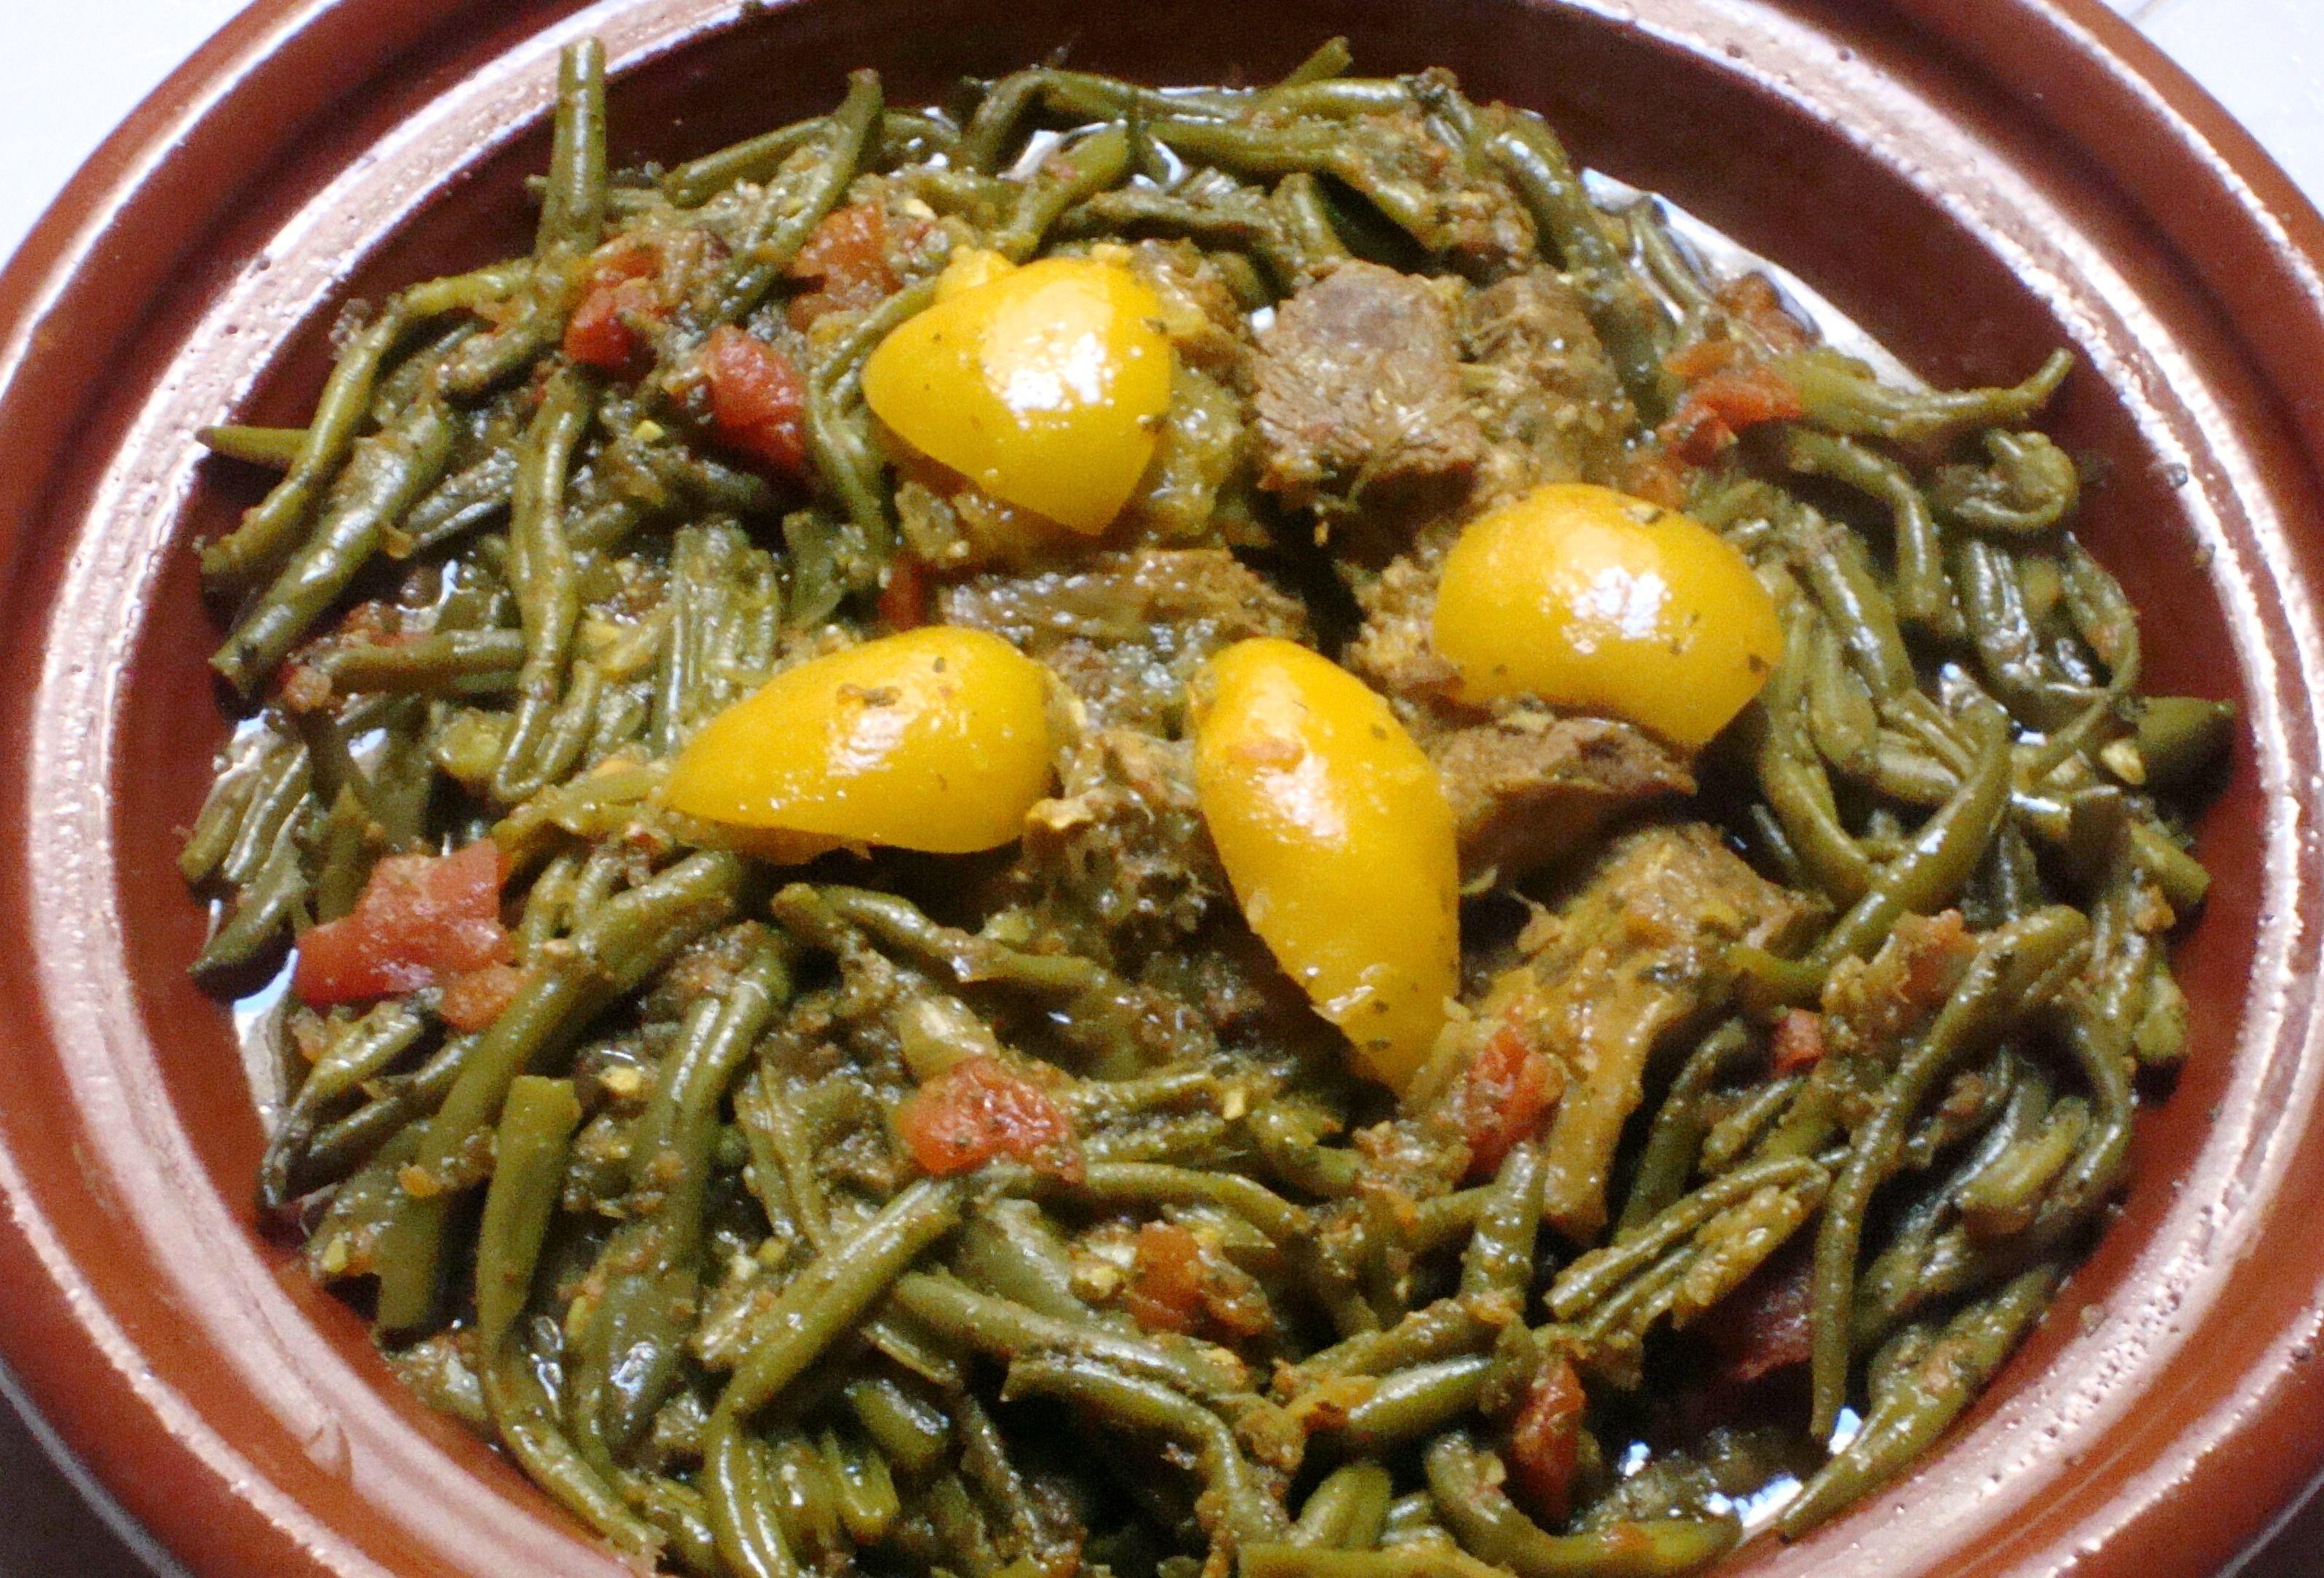 Lamb-Green-Beans-3264-x-2176.jpg